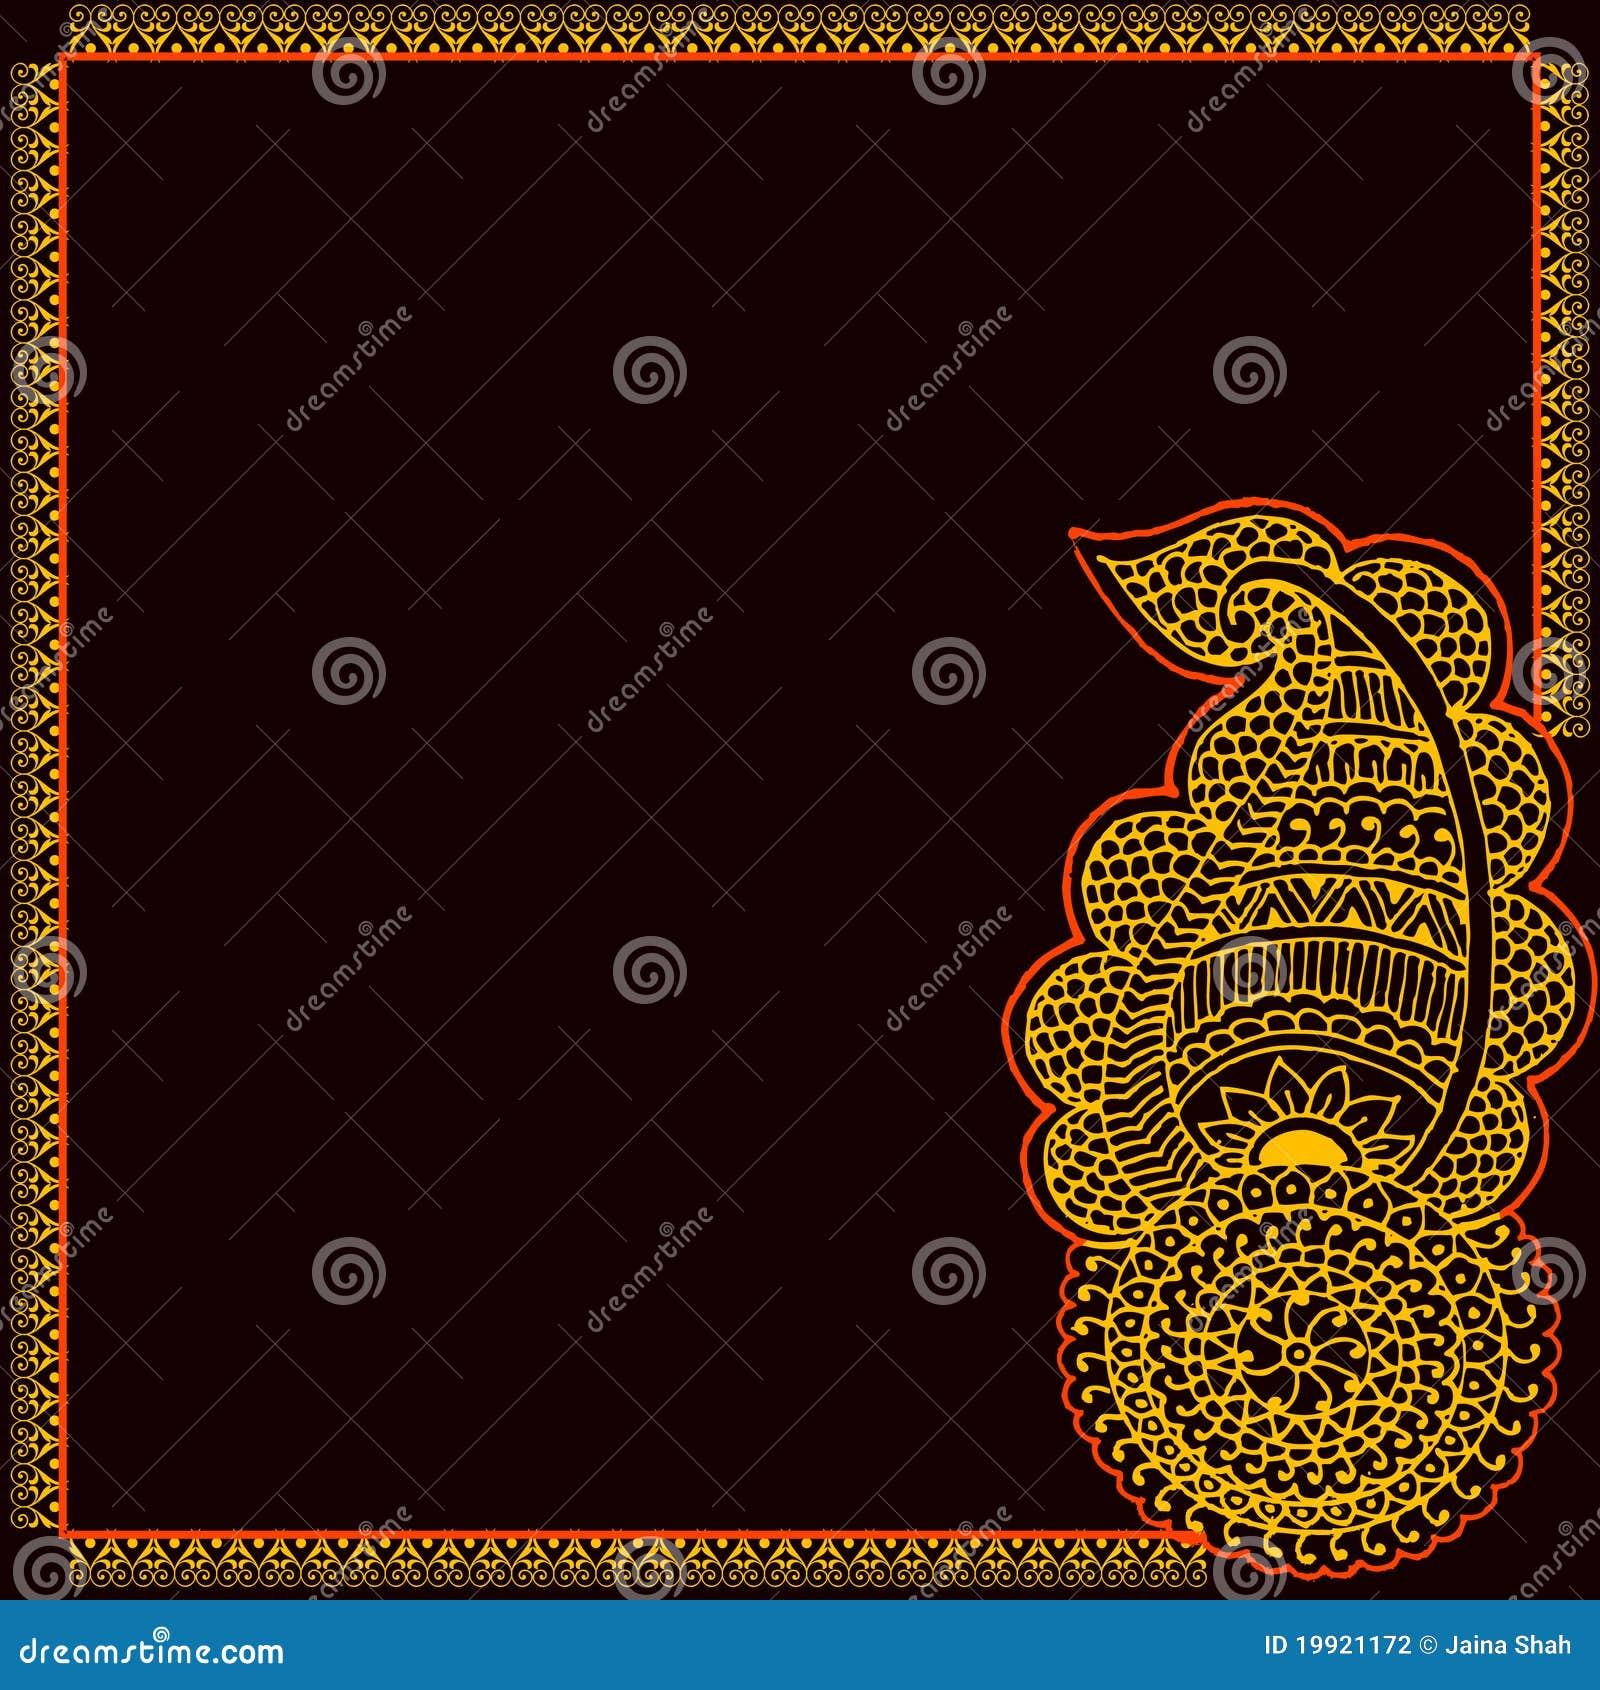 Dessin de carte d 39 invitation illustration de vecteur illustration du cr ateur indien 19921172 - Dessin invitation ...